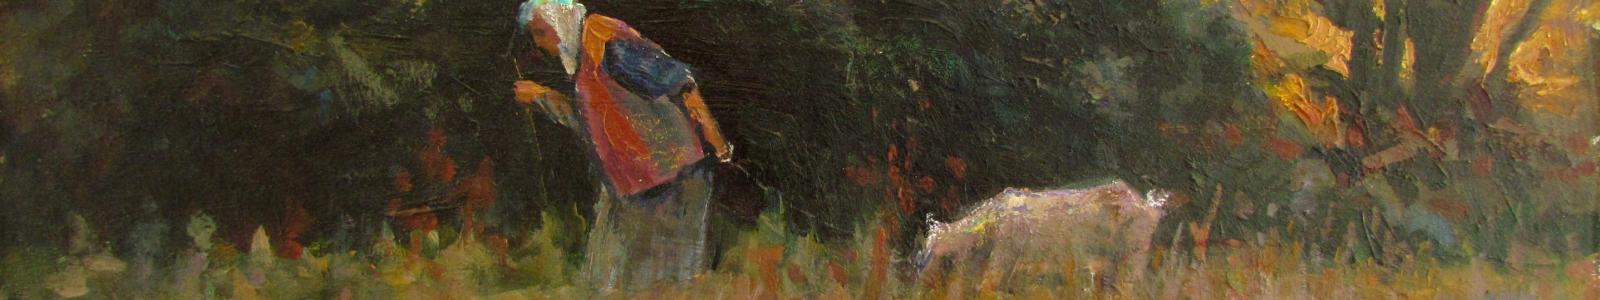 Gallery Tarelochka